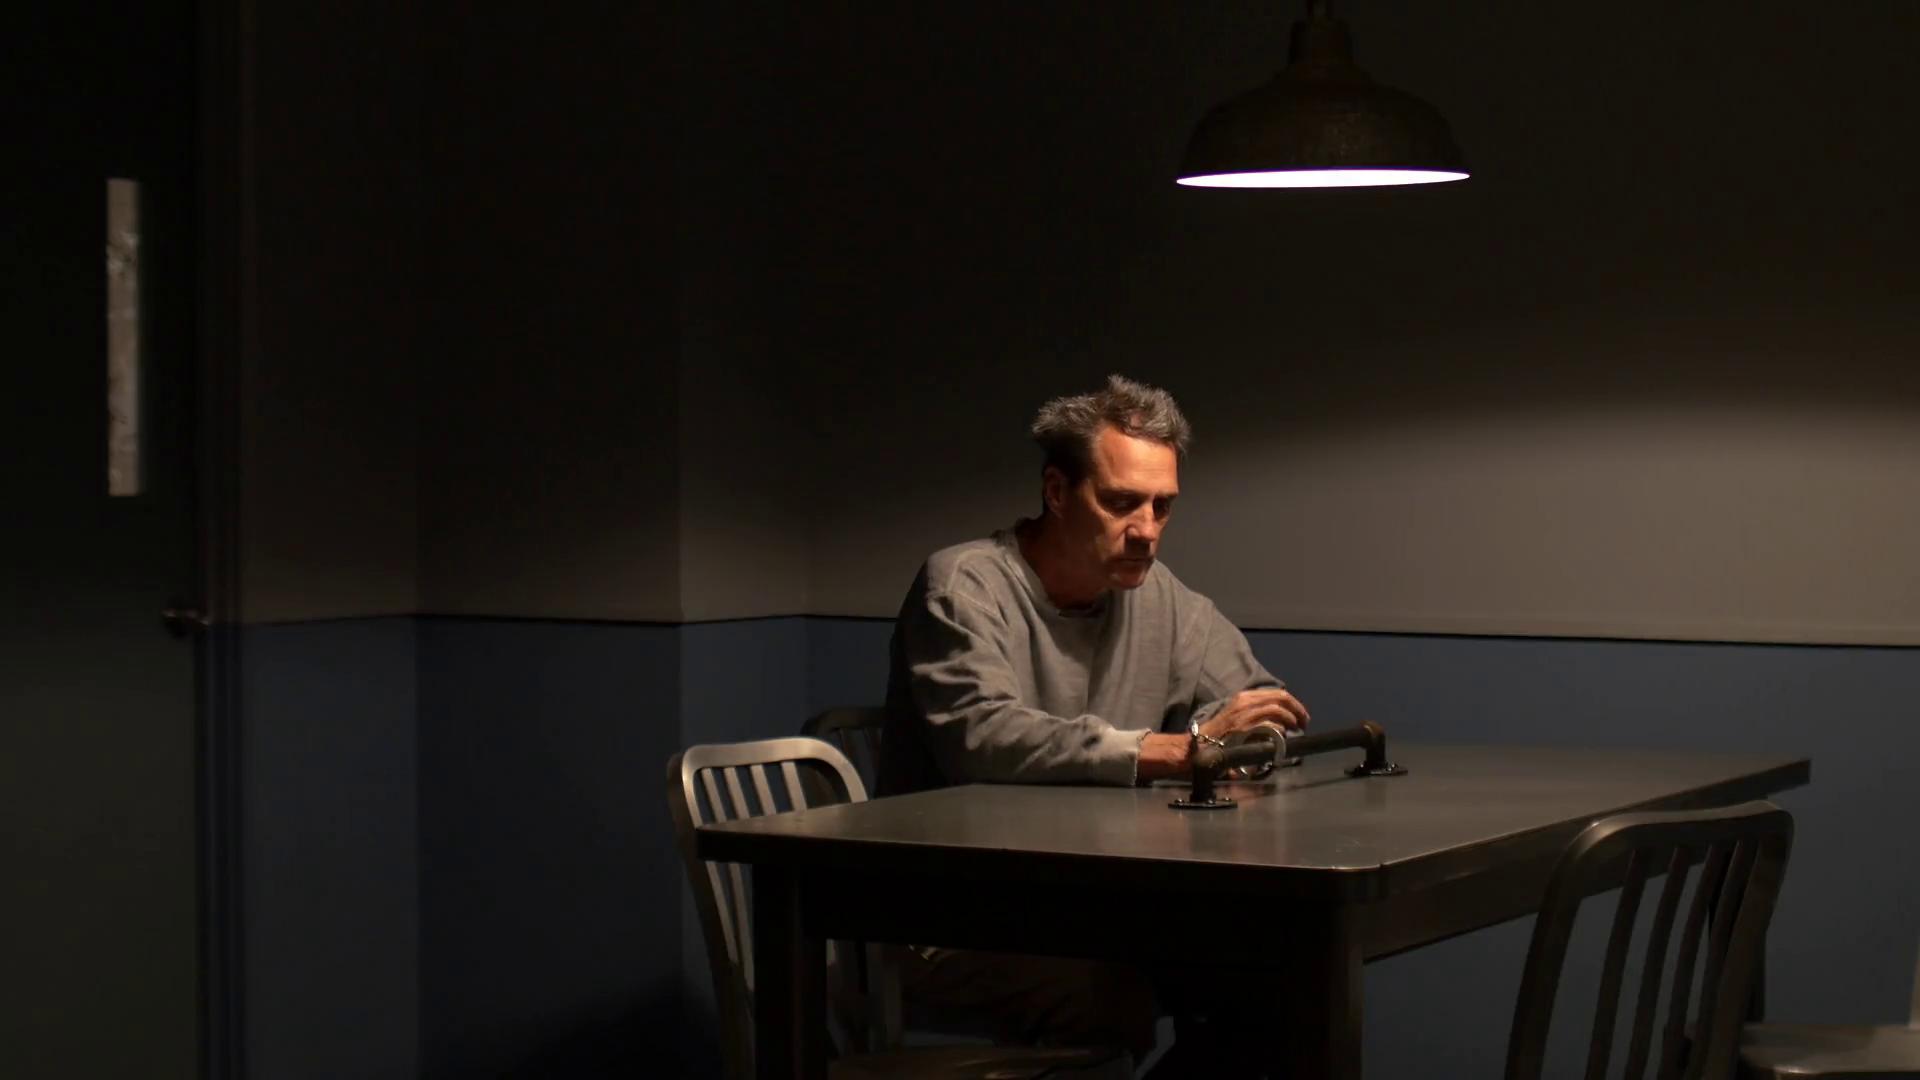 14 Interrogation mood ideas | scene, mood, film noir photography